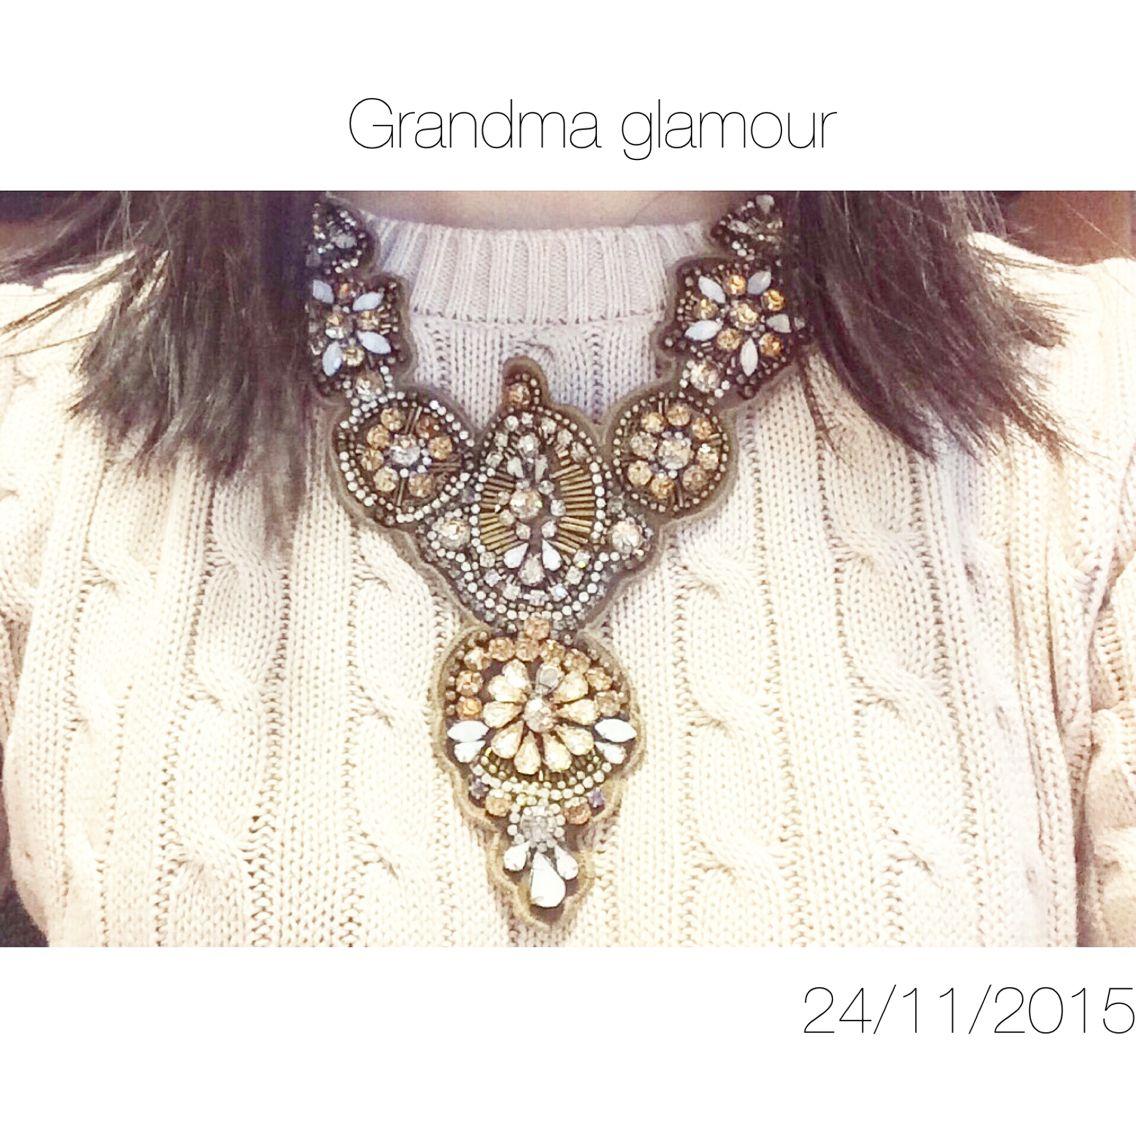 Grandma glamour